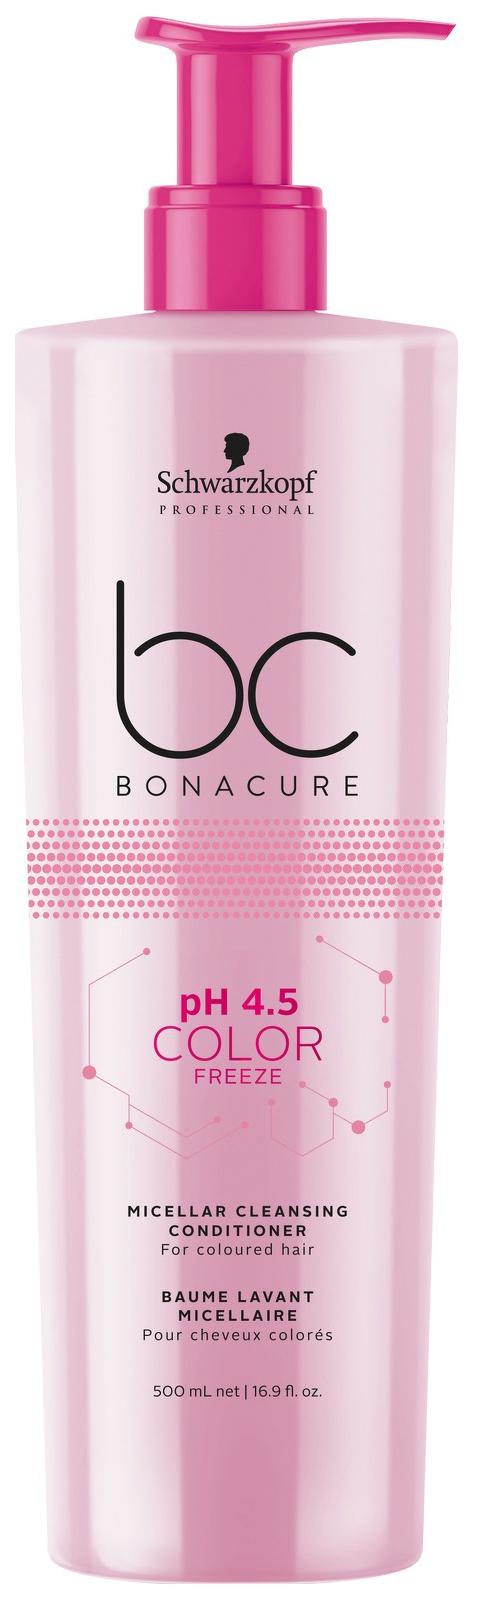 Кондиционер Schwarzkopf BC Bonacure pH 4,5 Color Freeze 500 мл фото